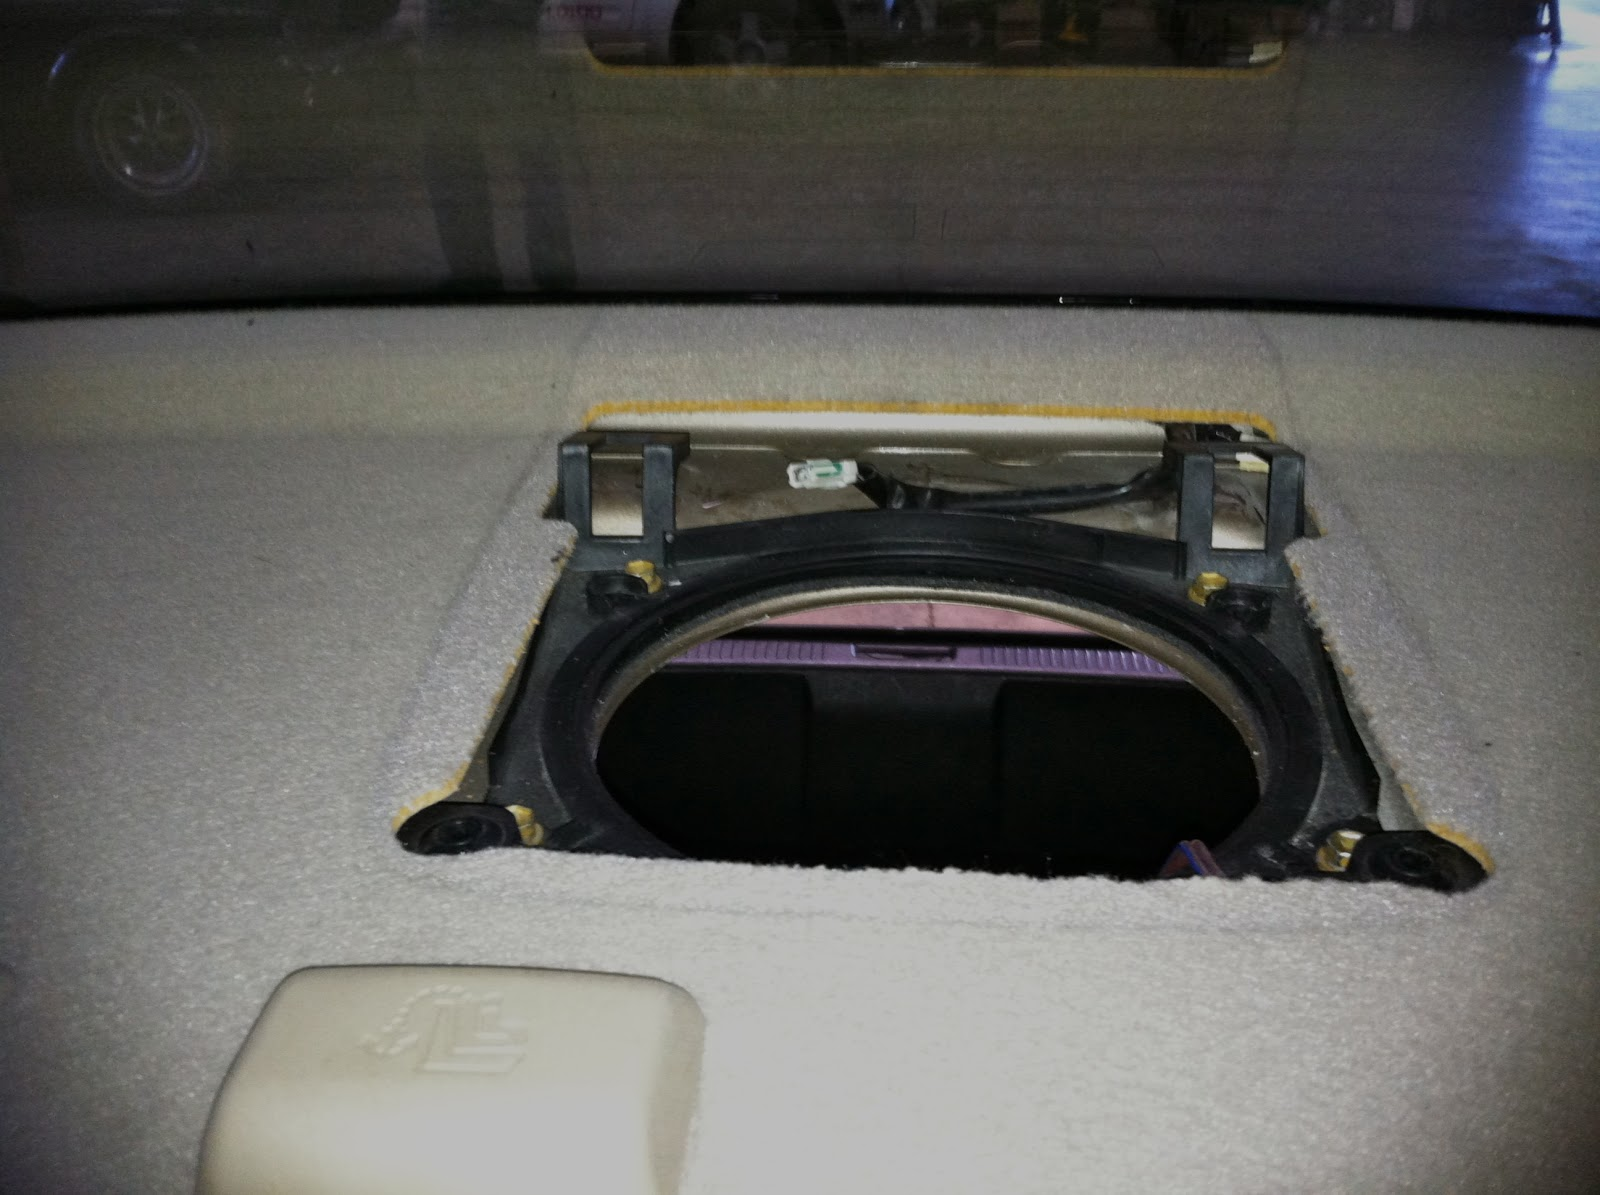 jbl 86160 ac180. 99-04 toyota avalon factory sub replacement. jbl 86160 ac180 e